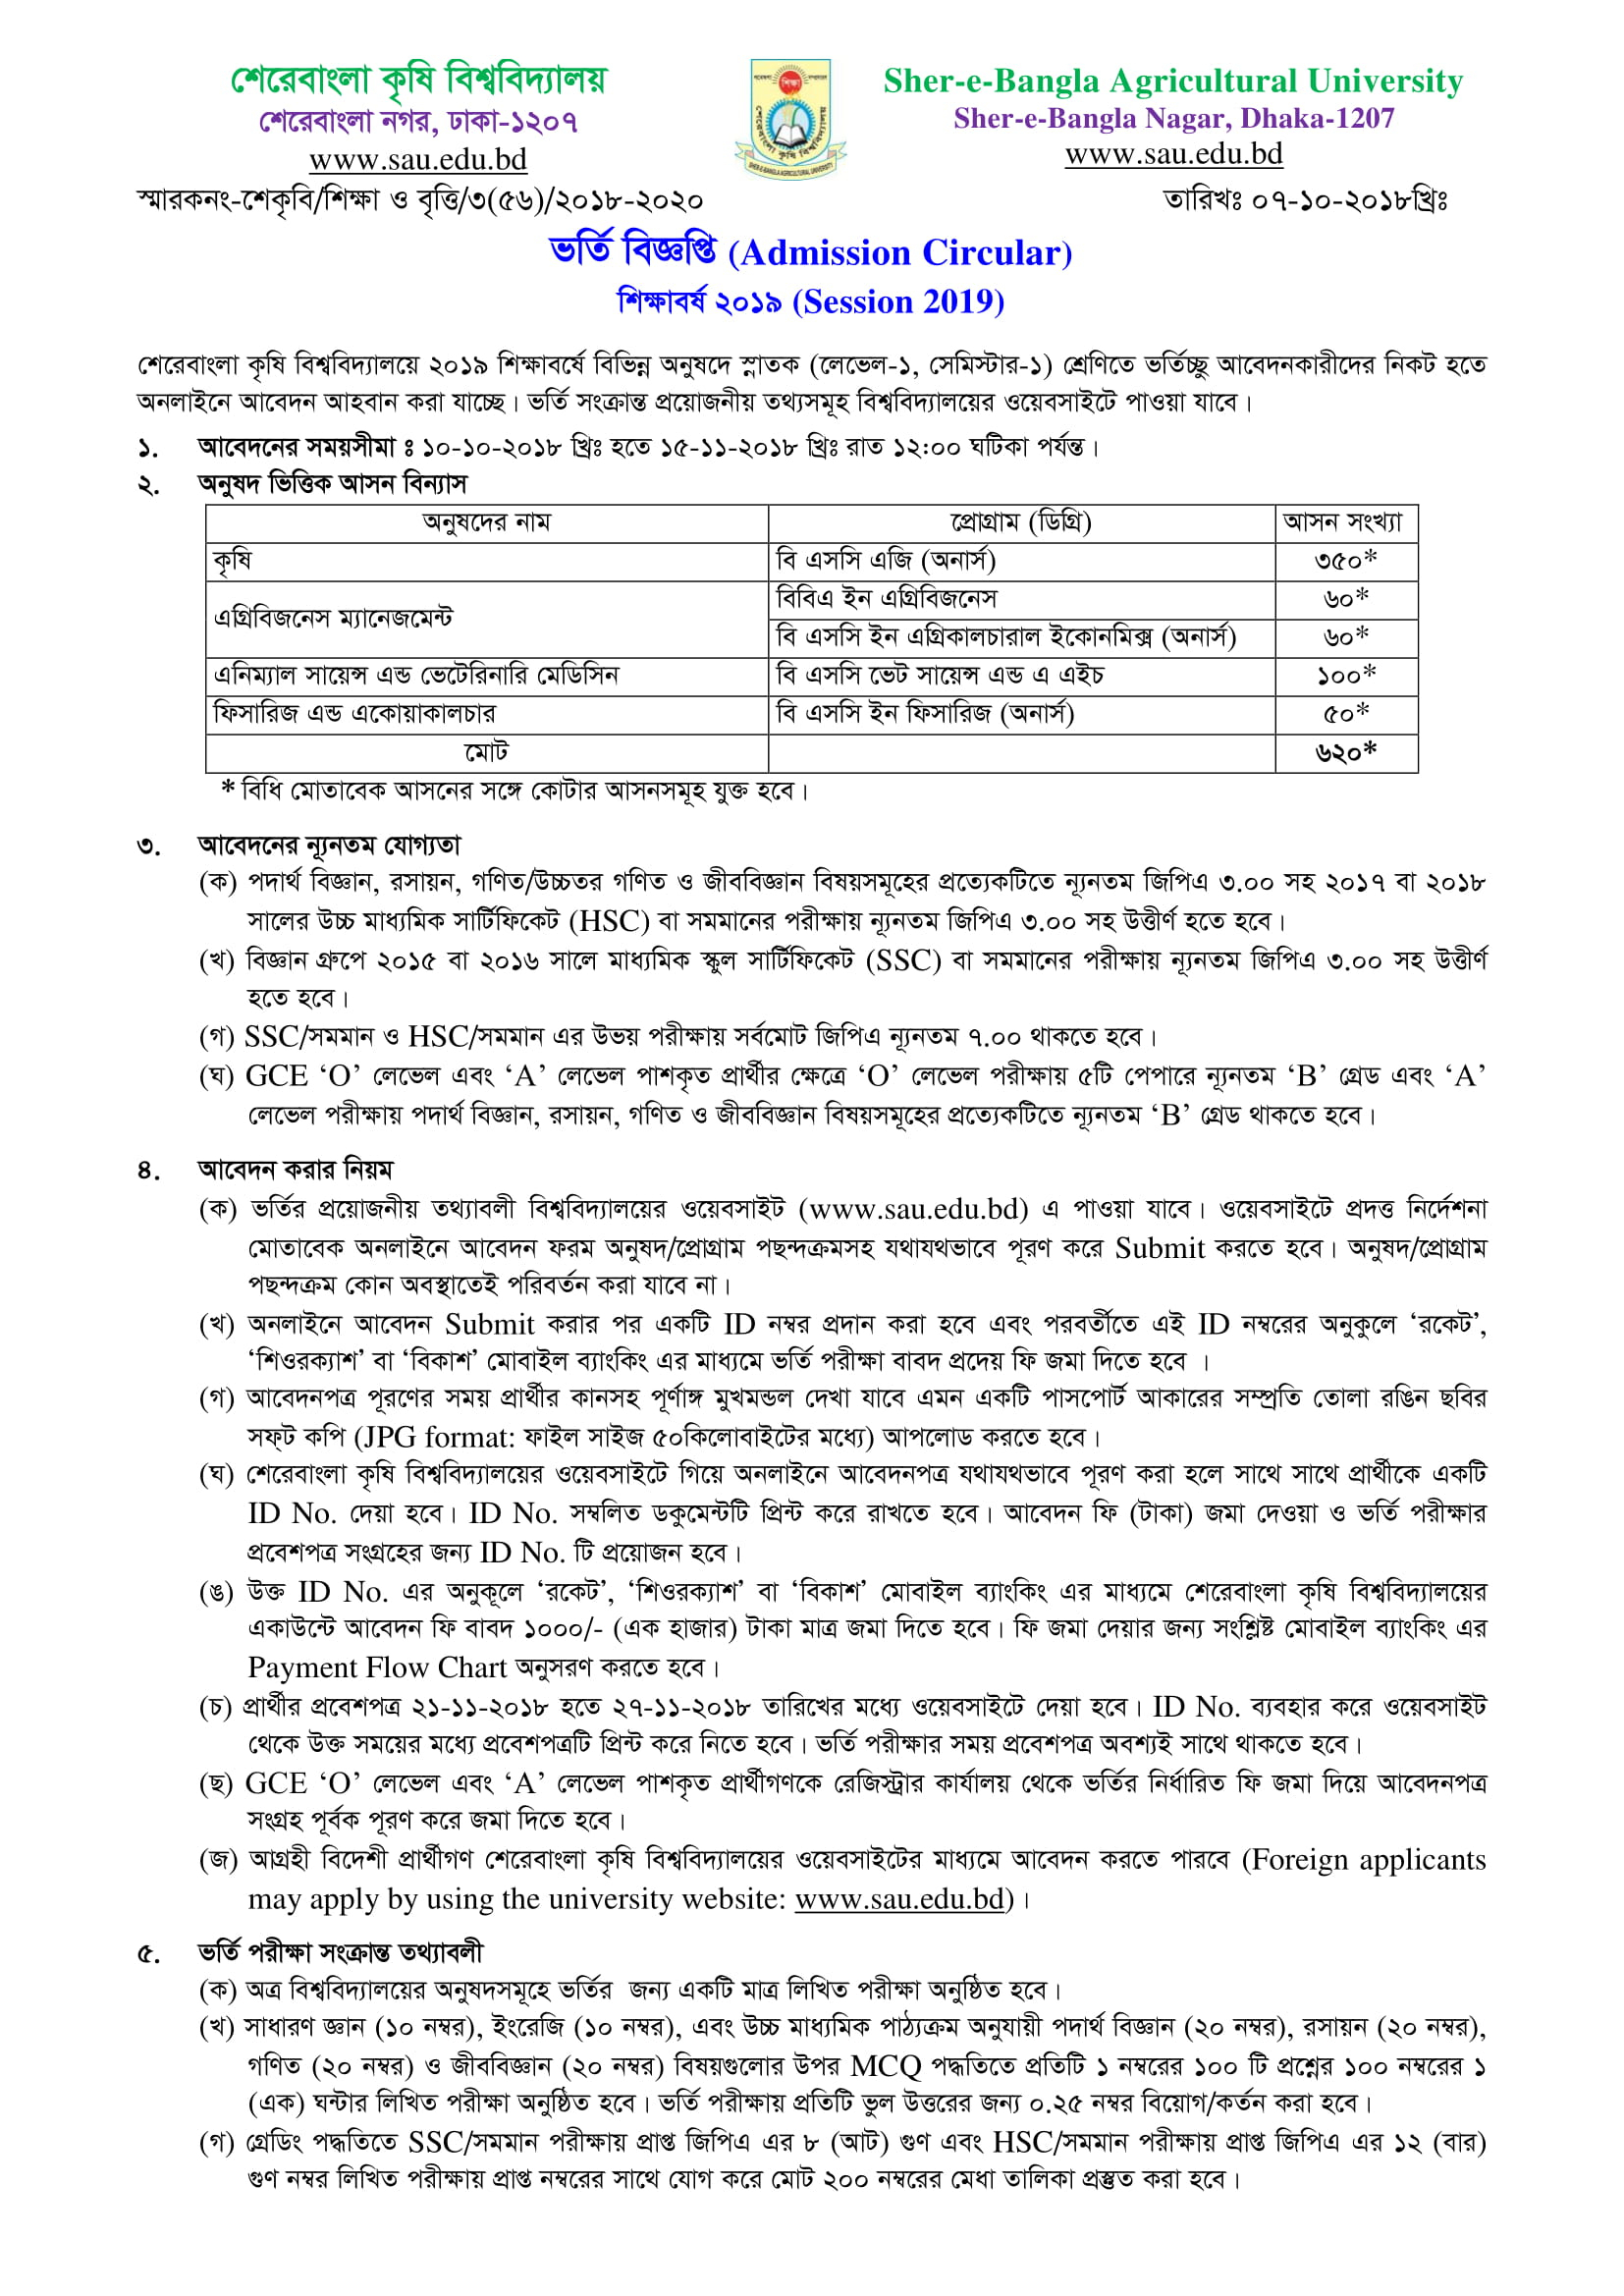 Sher E Bangla Agricultural University Circular 2019-20 | Sau